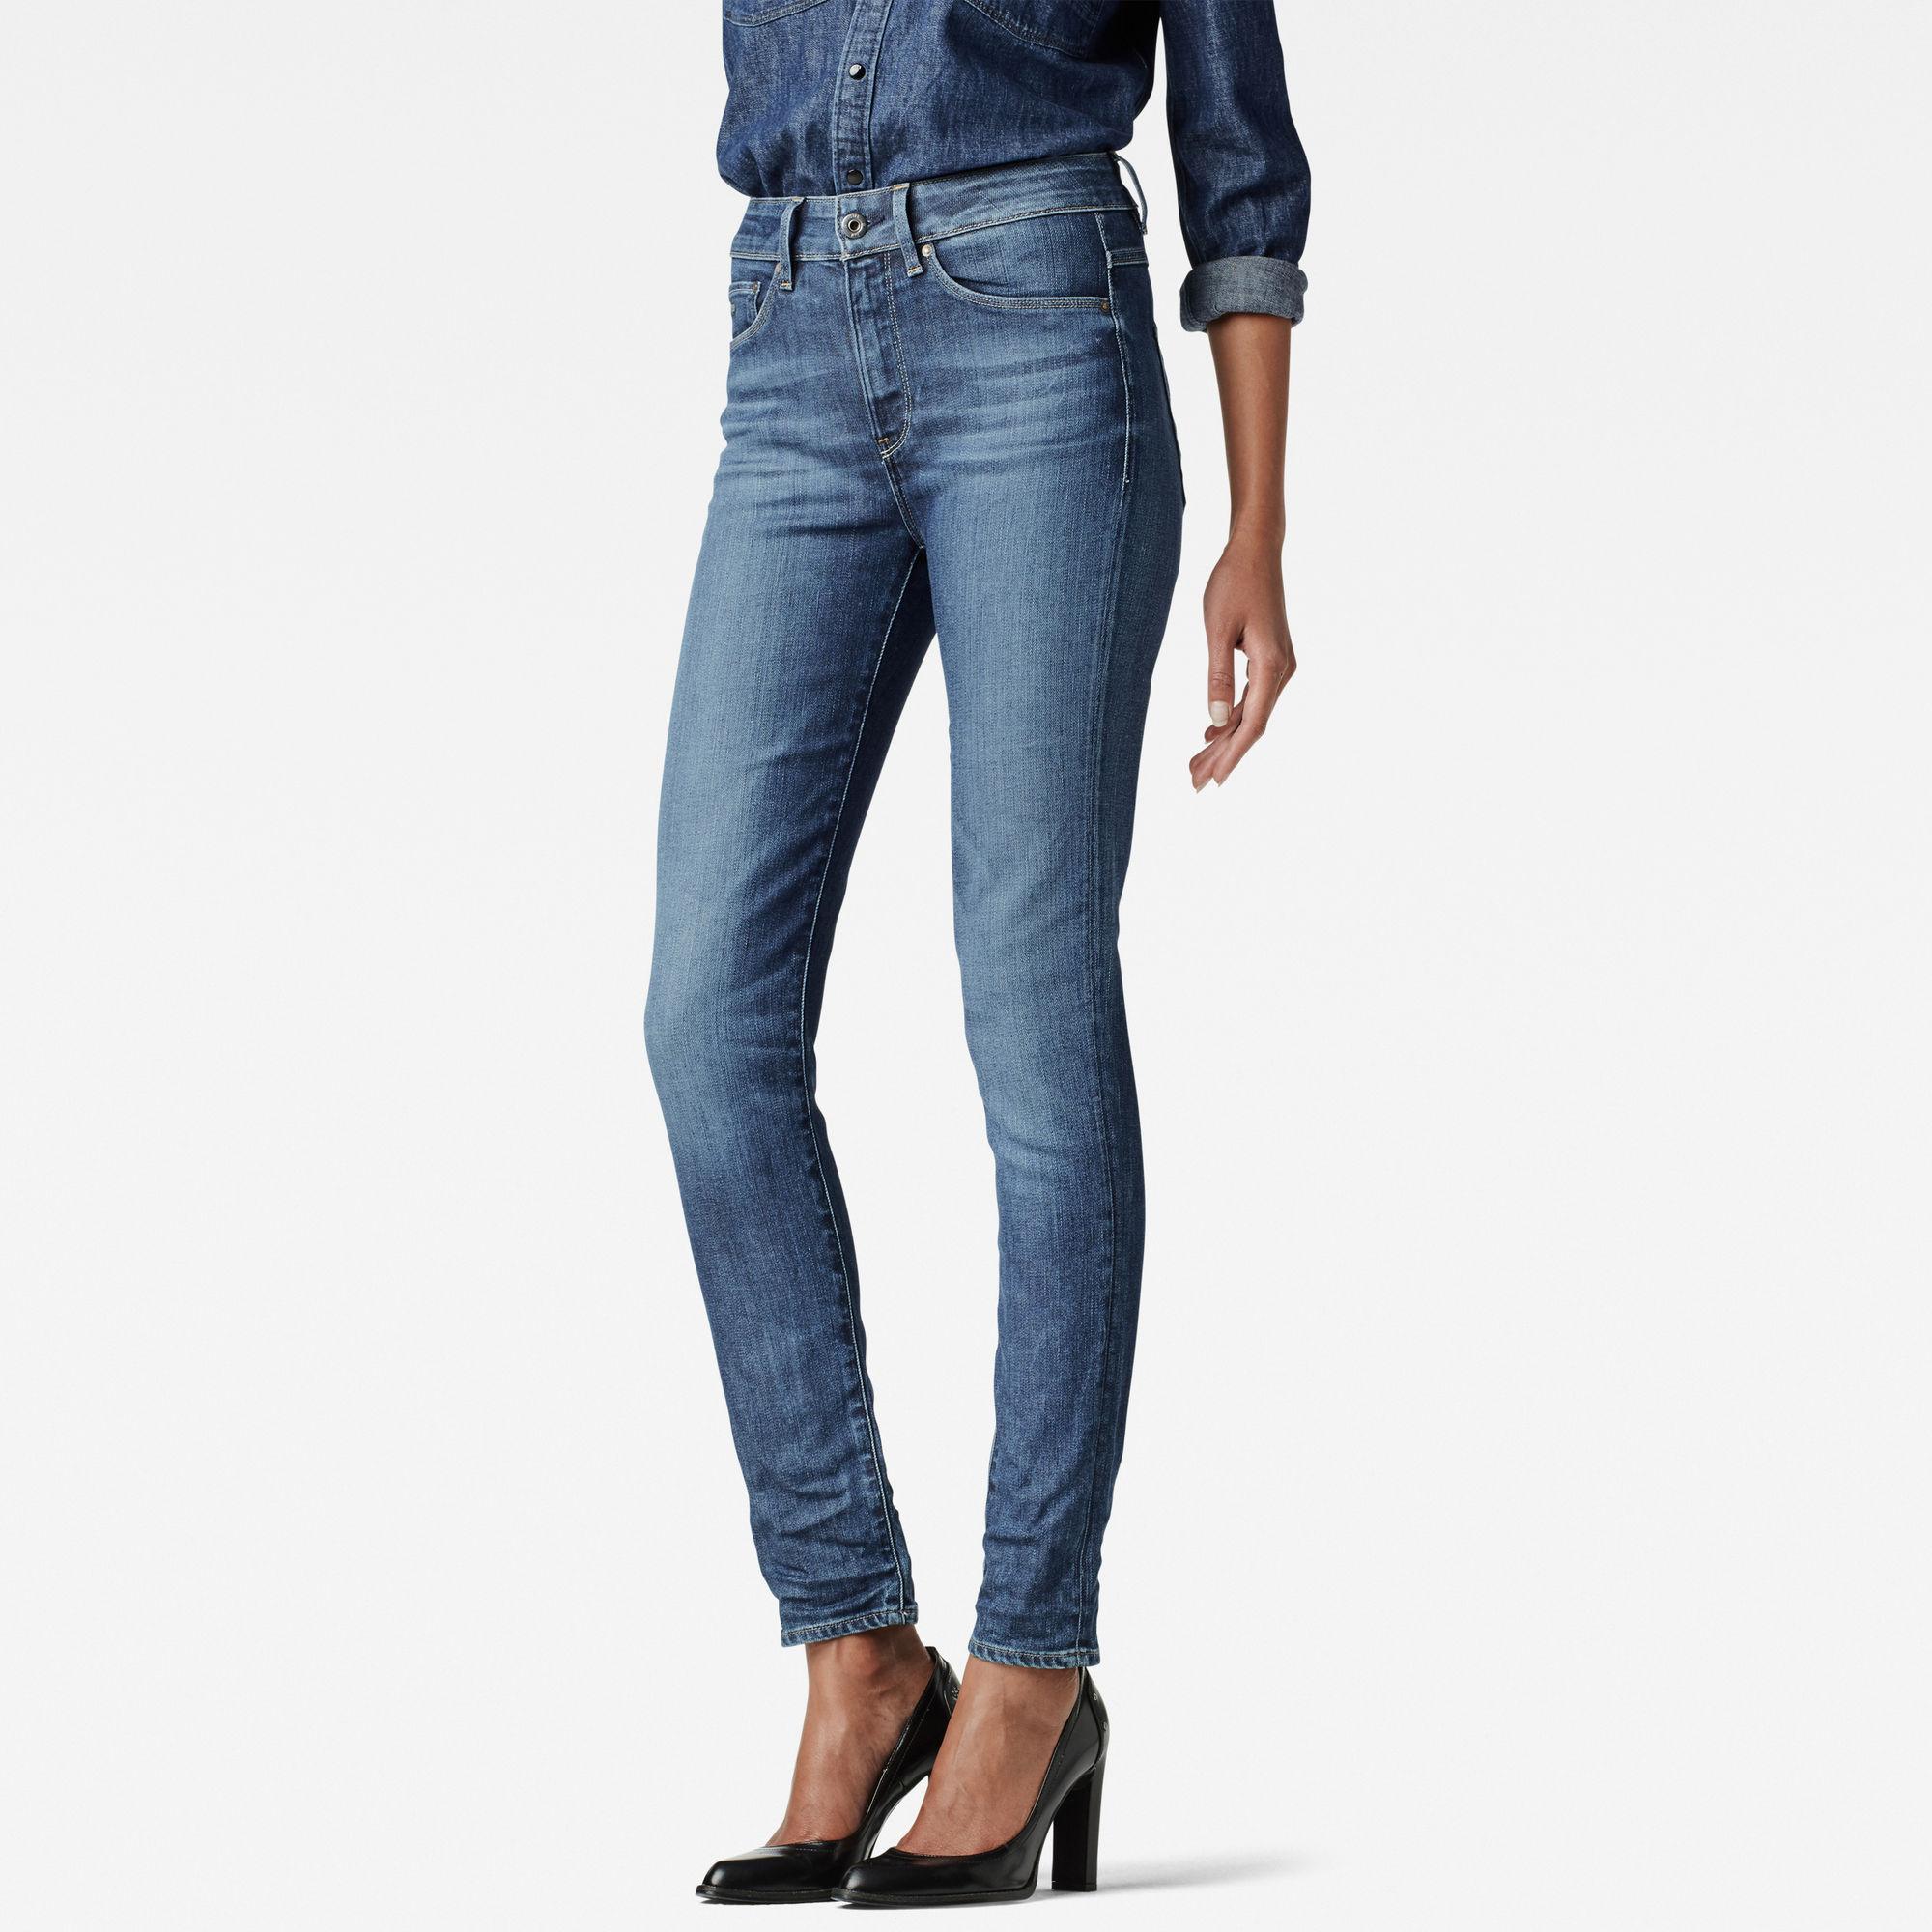 Van G Star Raw 3301 Ultra High Waist Super Skinny Jeans Prijsvergelijk nu!